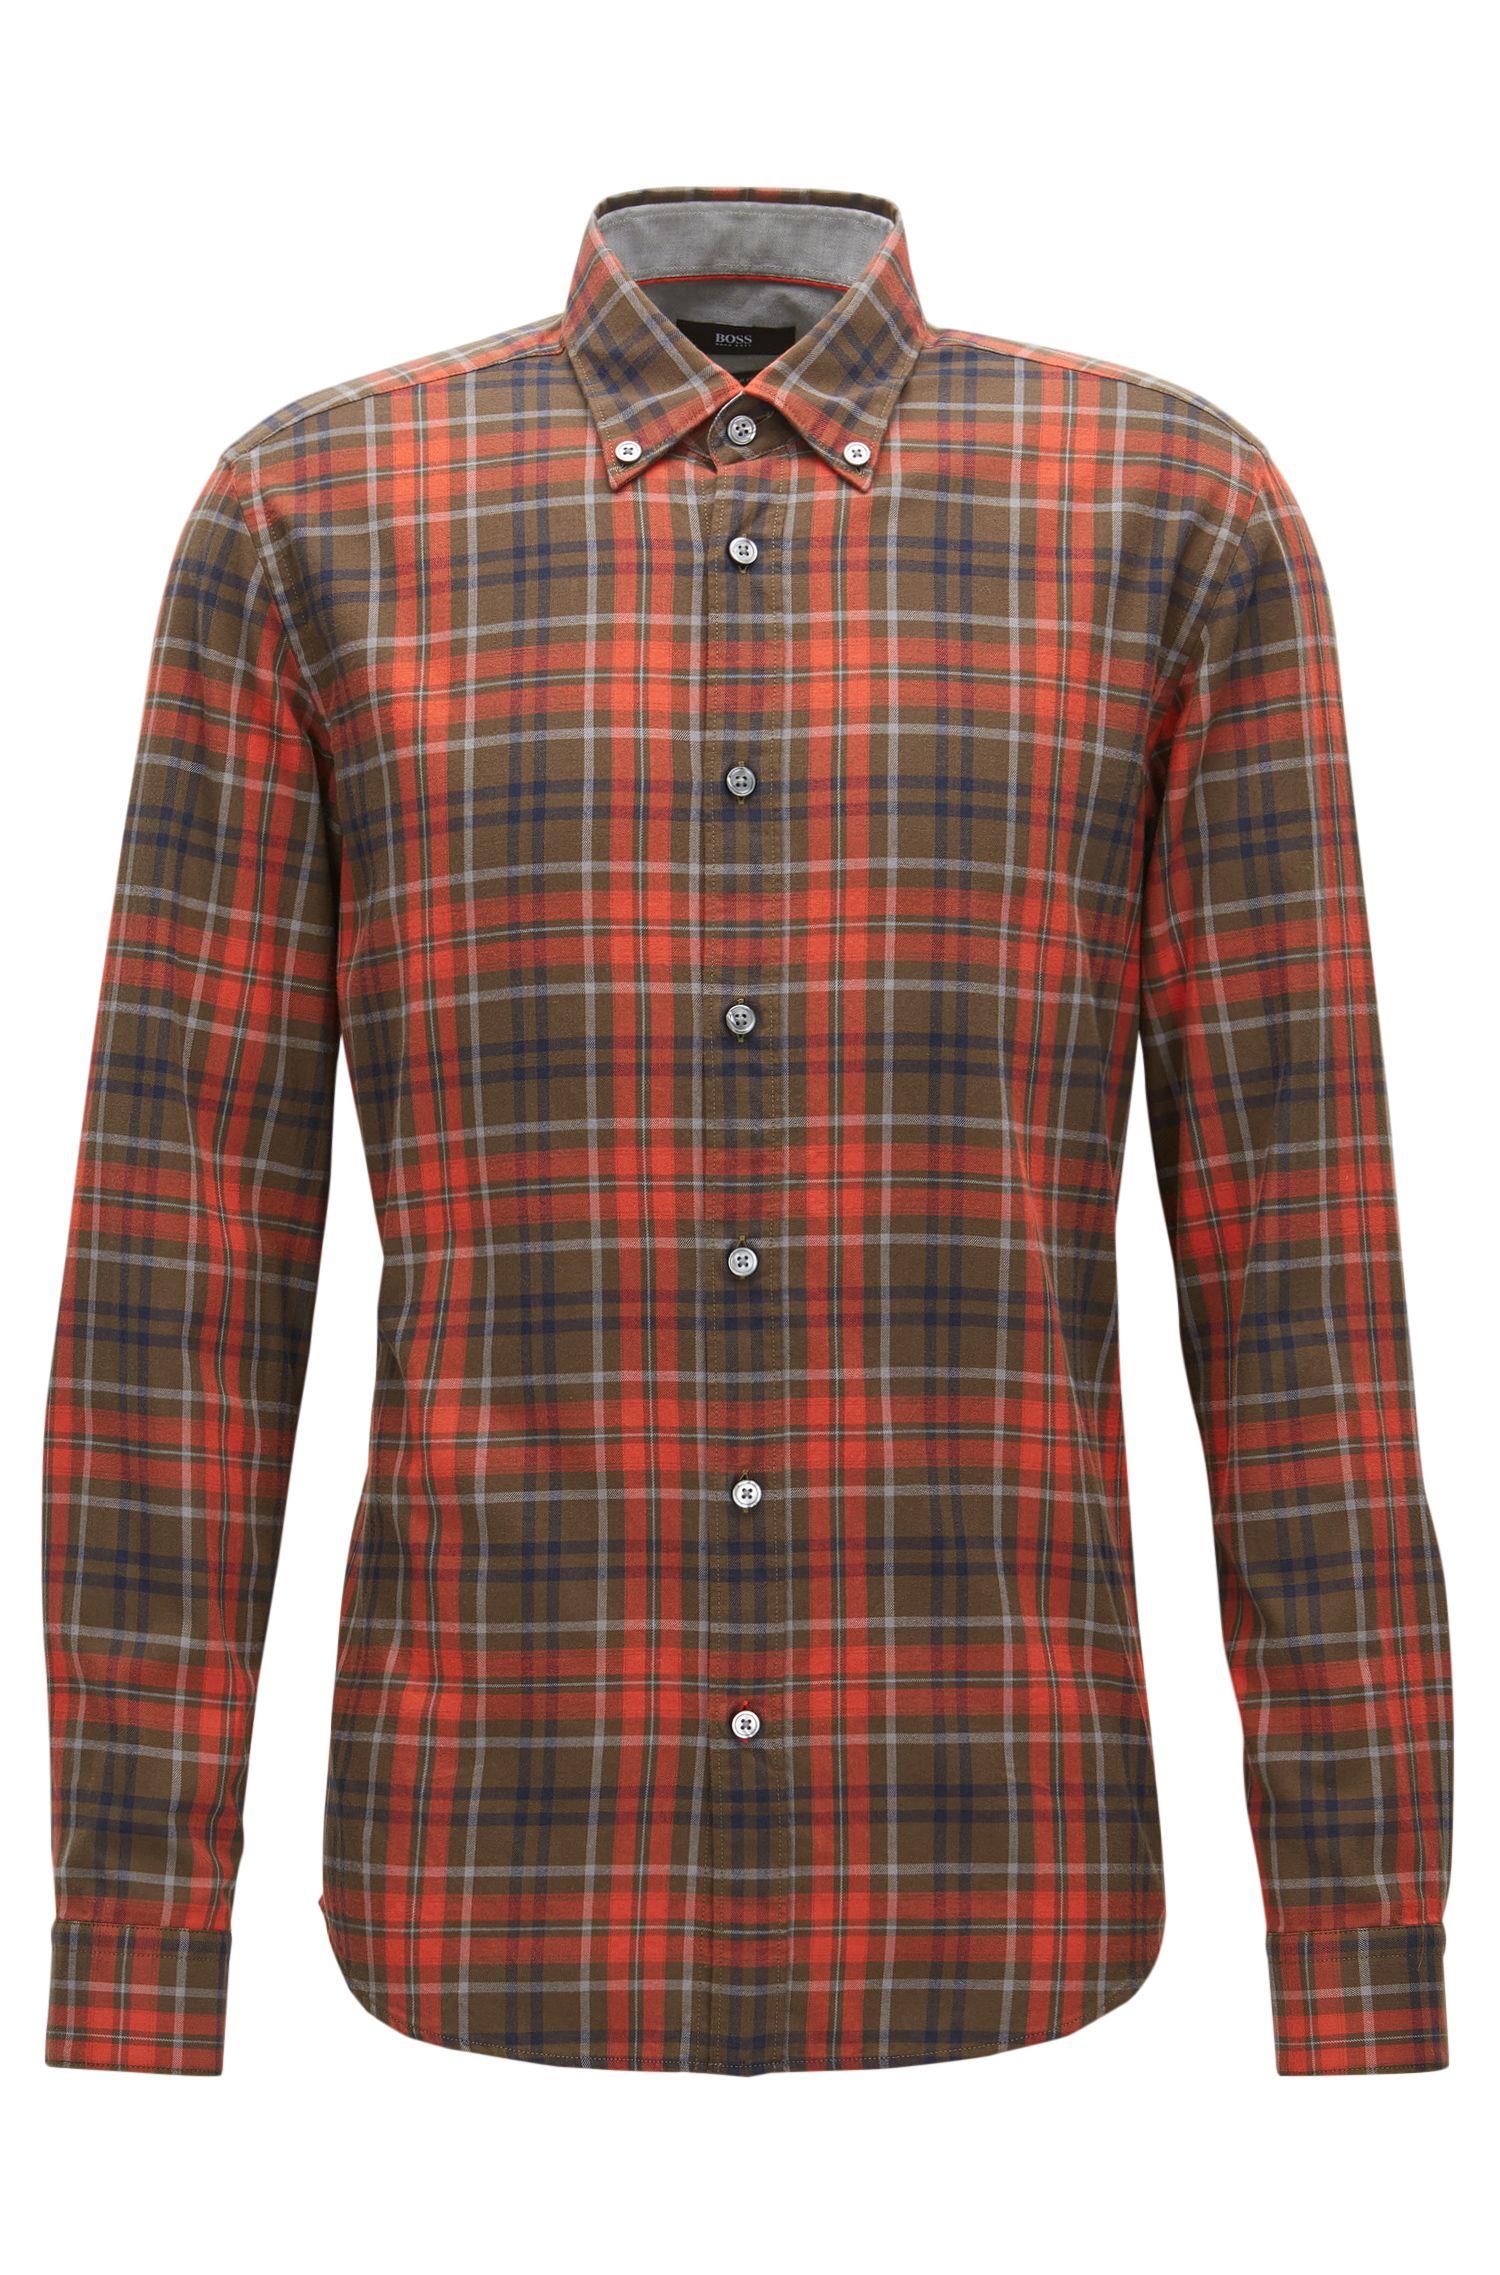 Plaid Cotton Button Down Shirt, Regular Fit | Lod